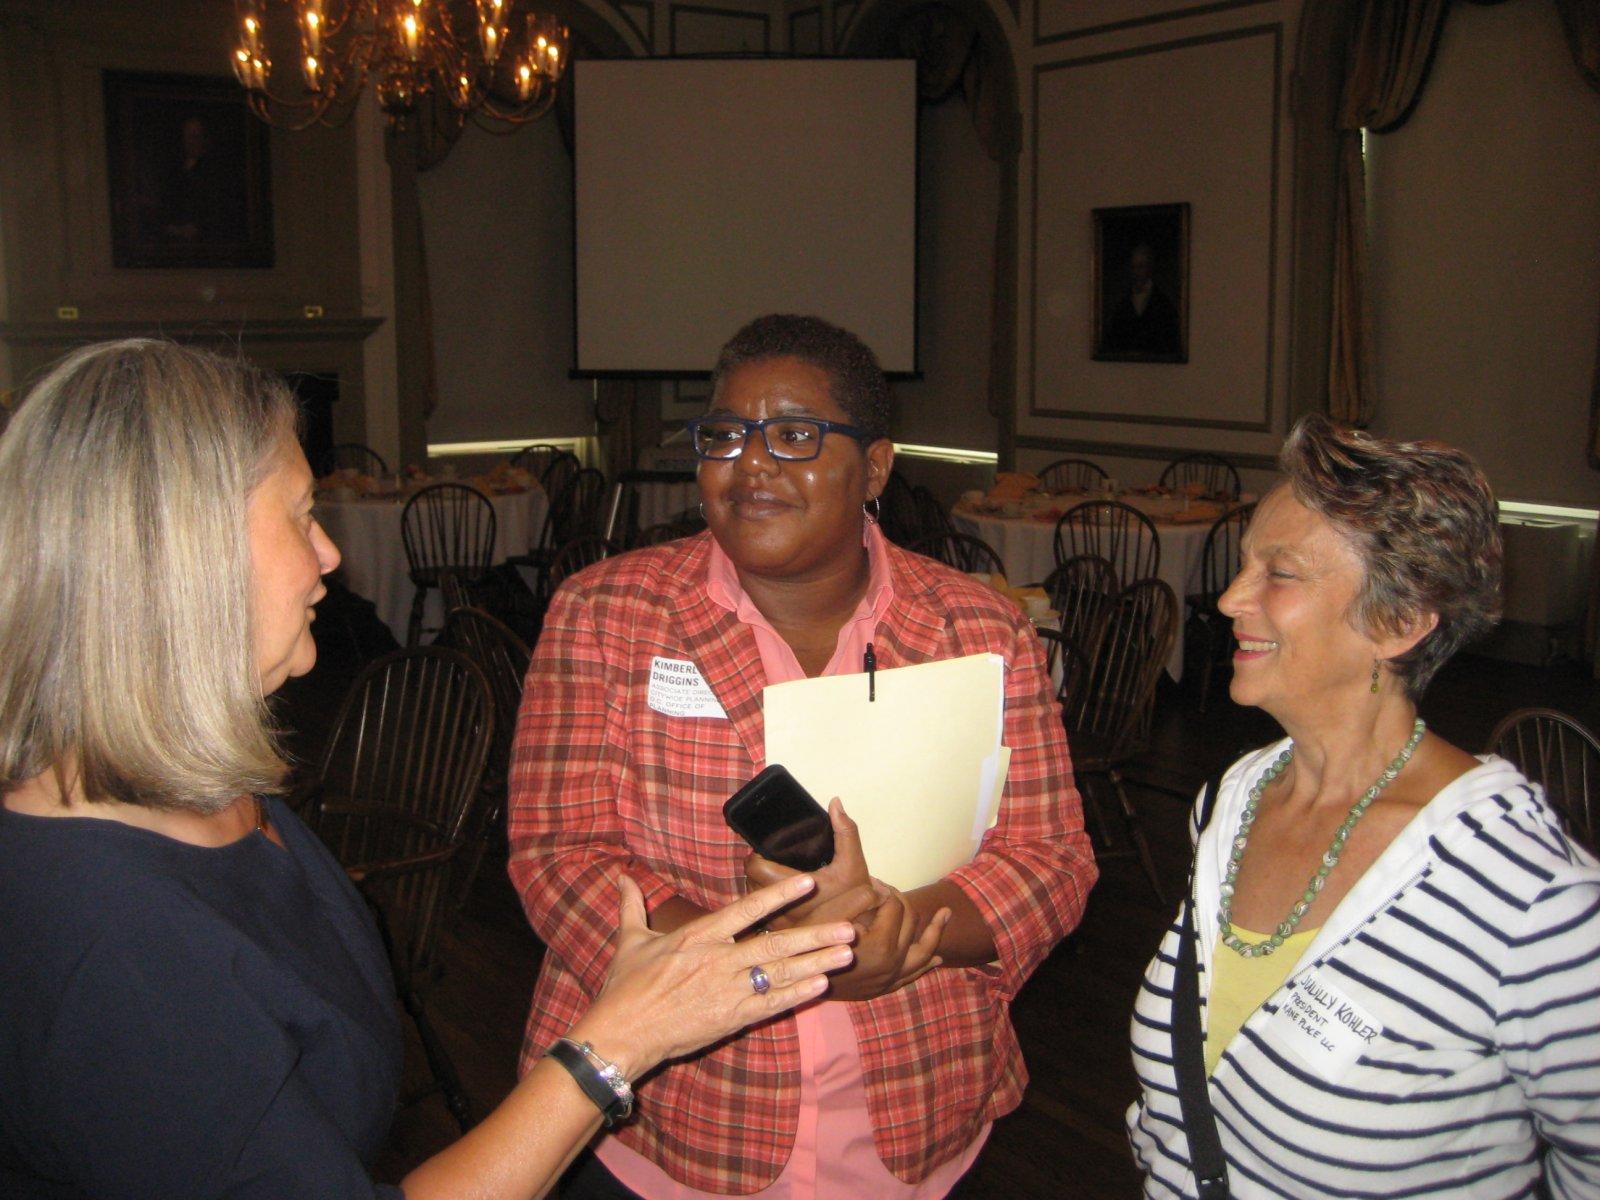 Julia Taylor, Kimberly Driggins, and Julilly Kohler.